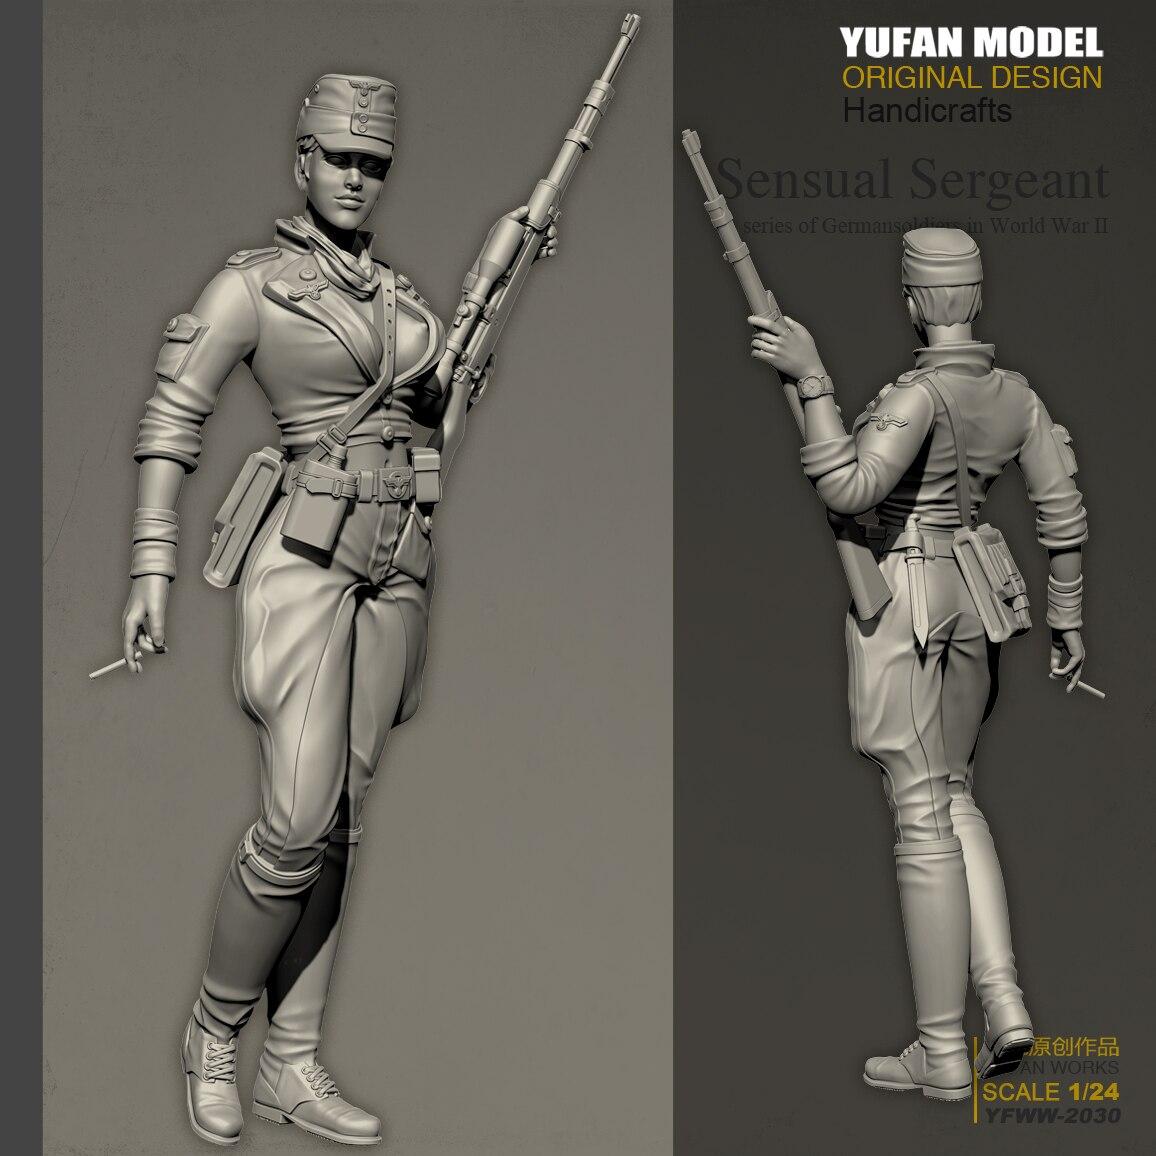 YUFAN Model 1/24 Resin Kits  Sexy Female Gunner Resin Soldier Self-assembled (75mm) YFWW-2030